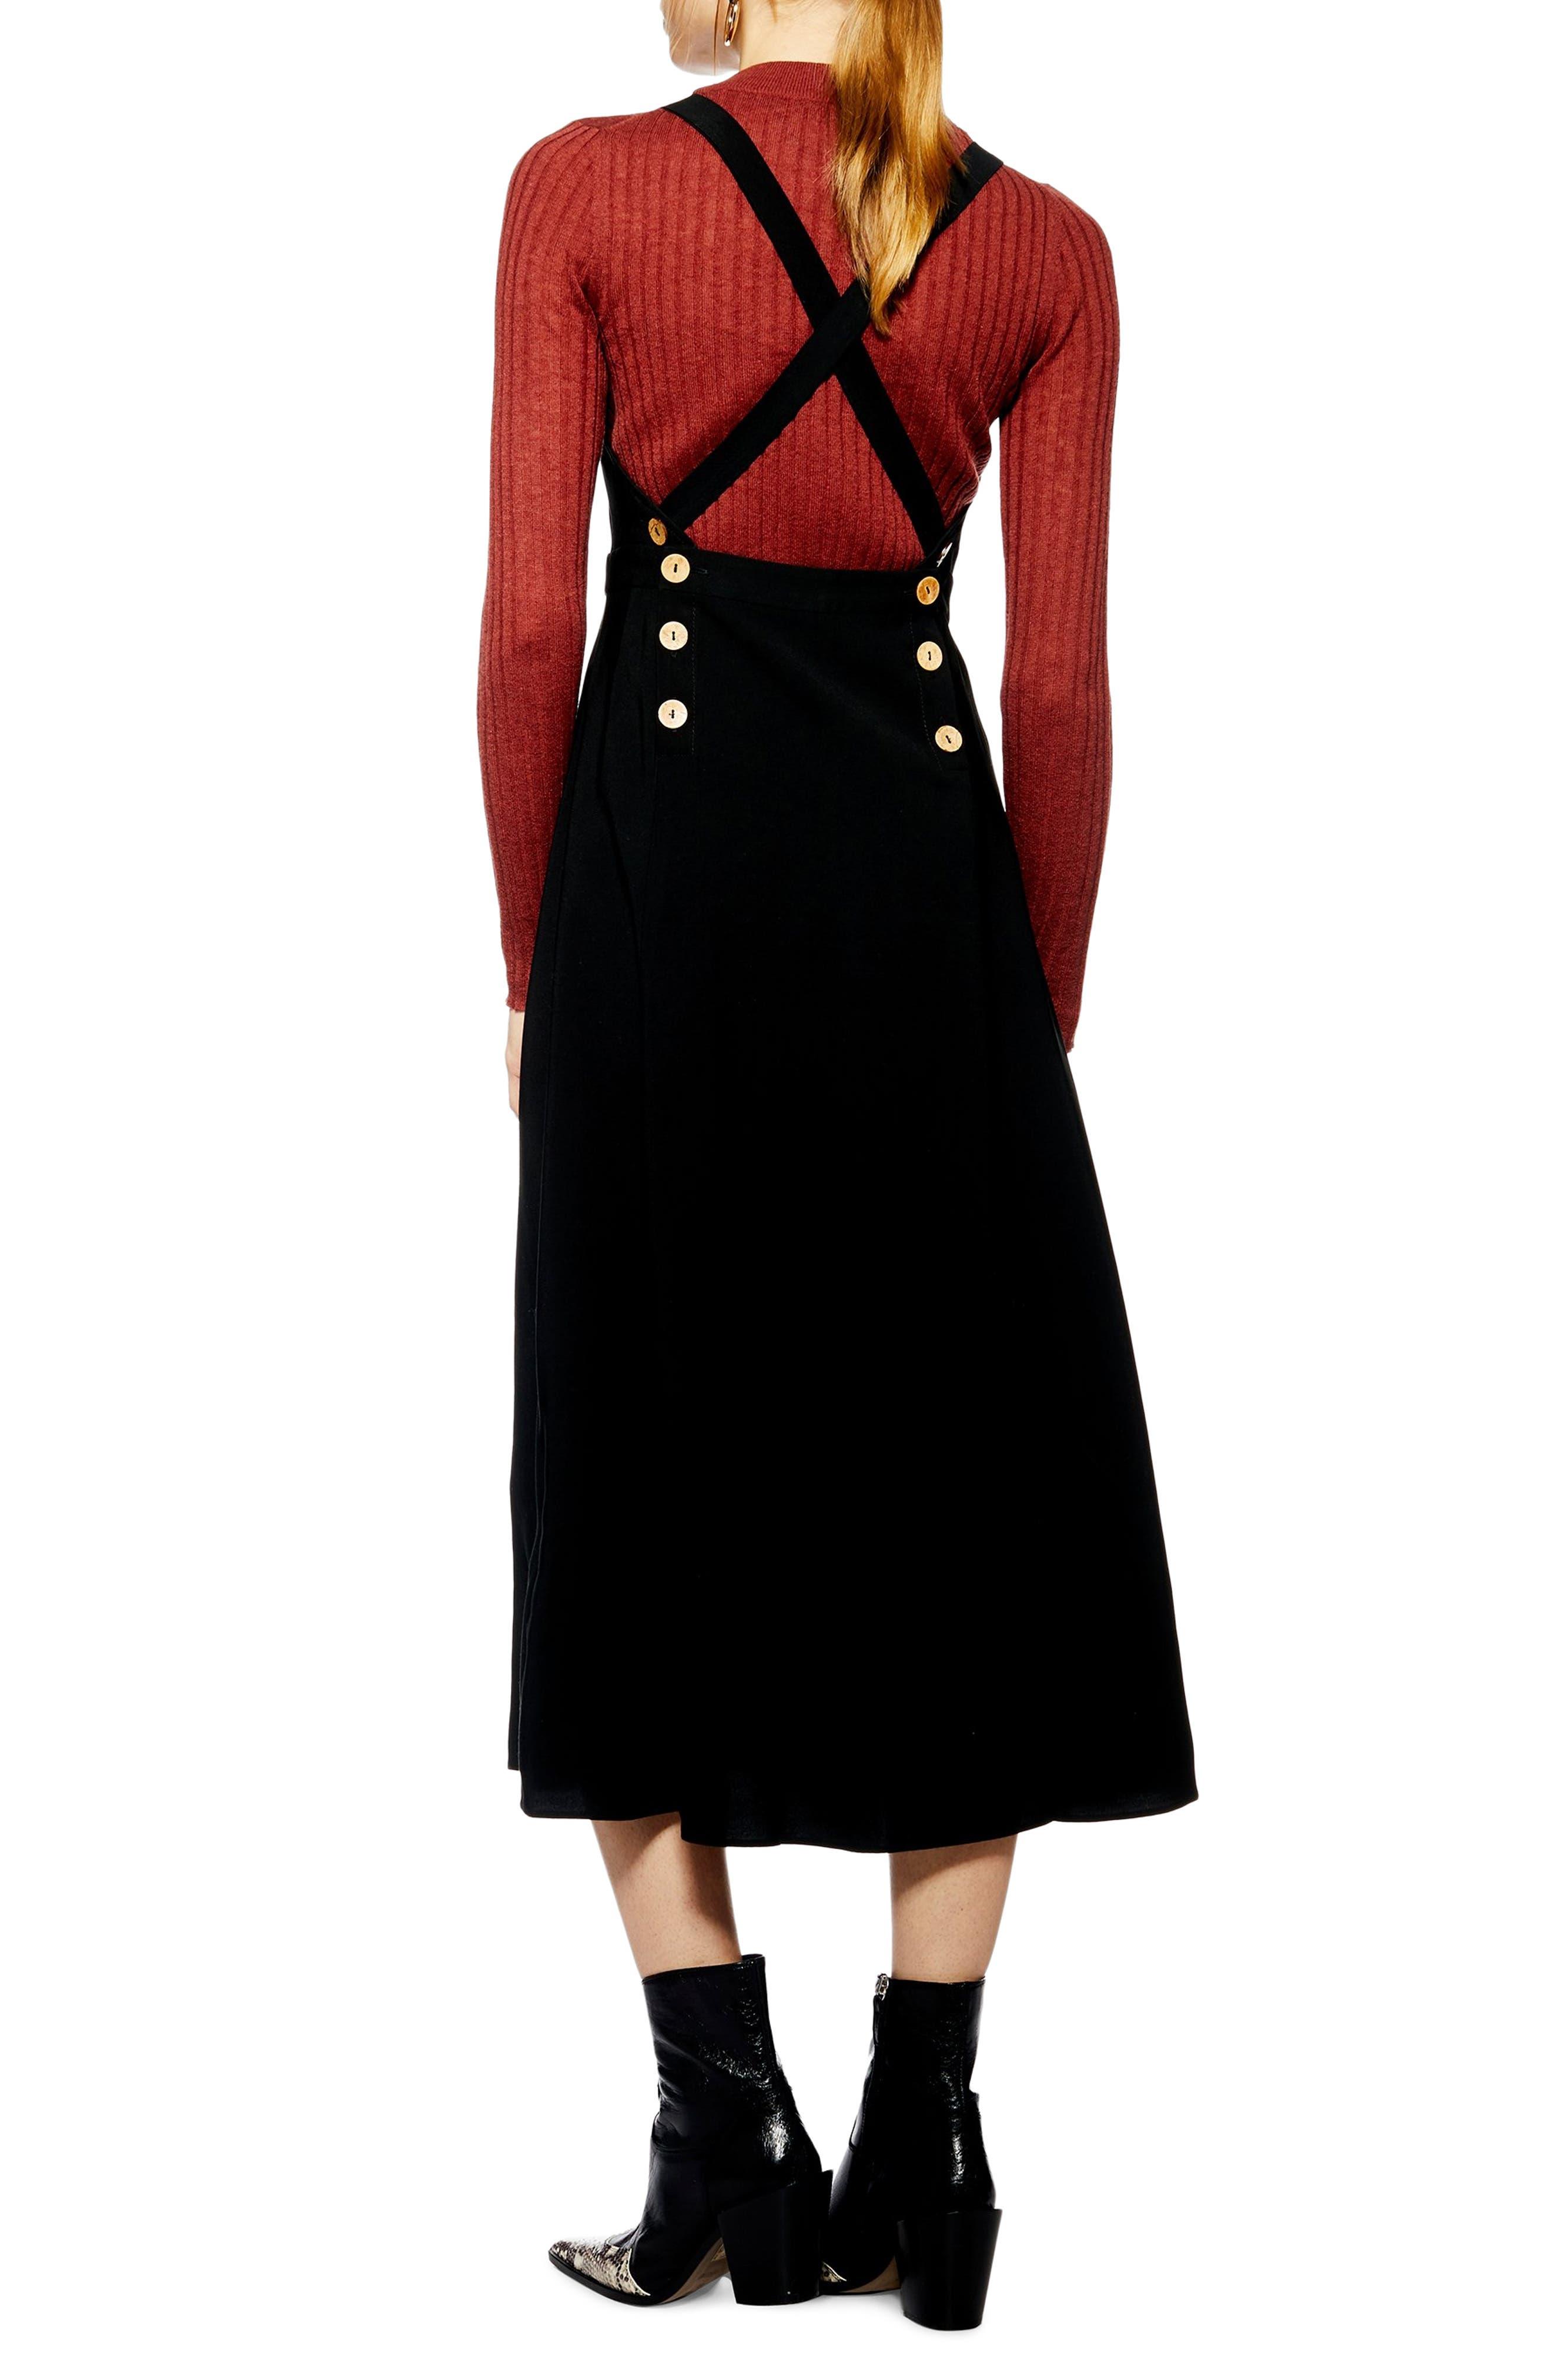 TOPSHOP, Tilda Pinafore Midi Dress, Alternate thumbnail 2, color, BLACK